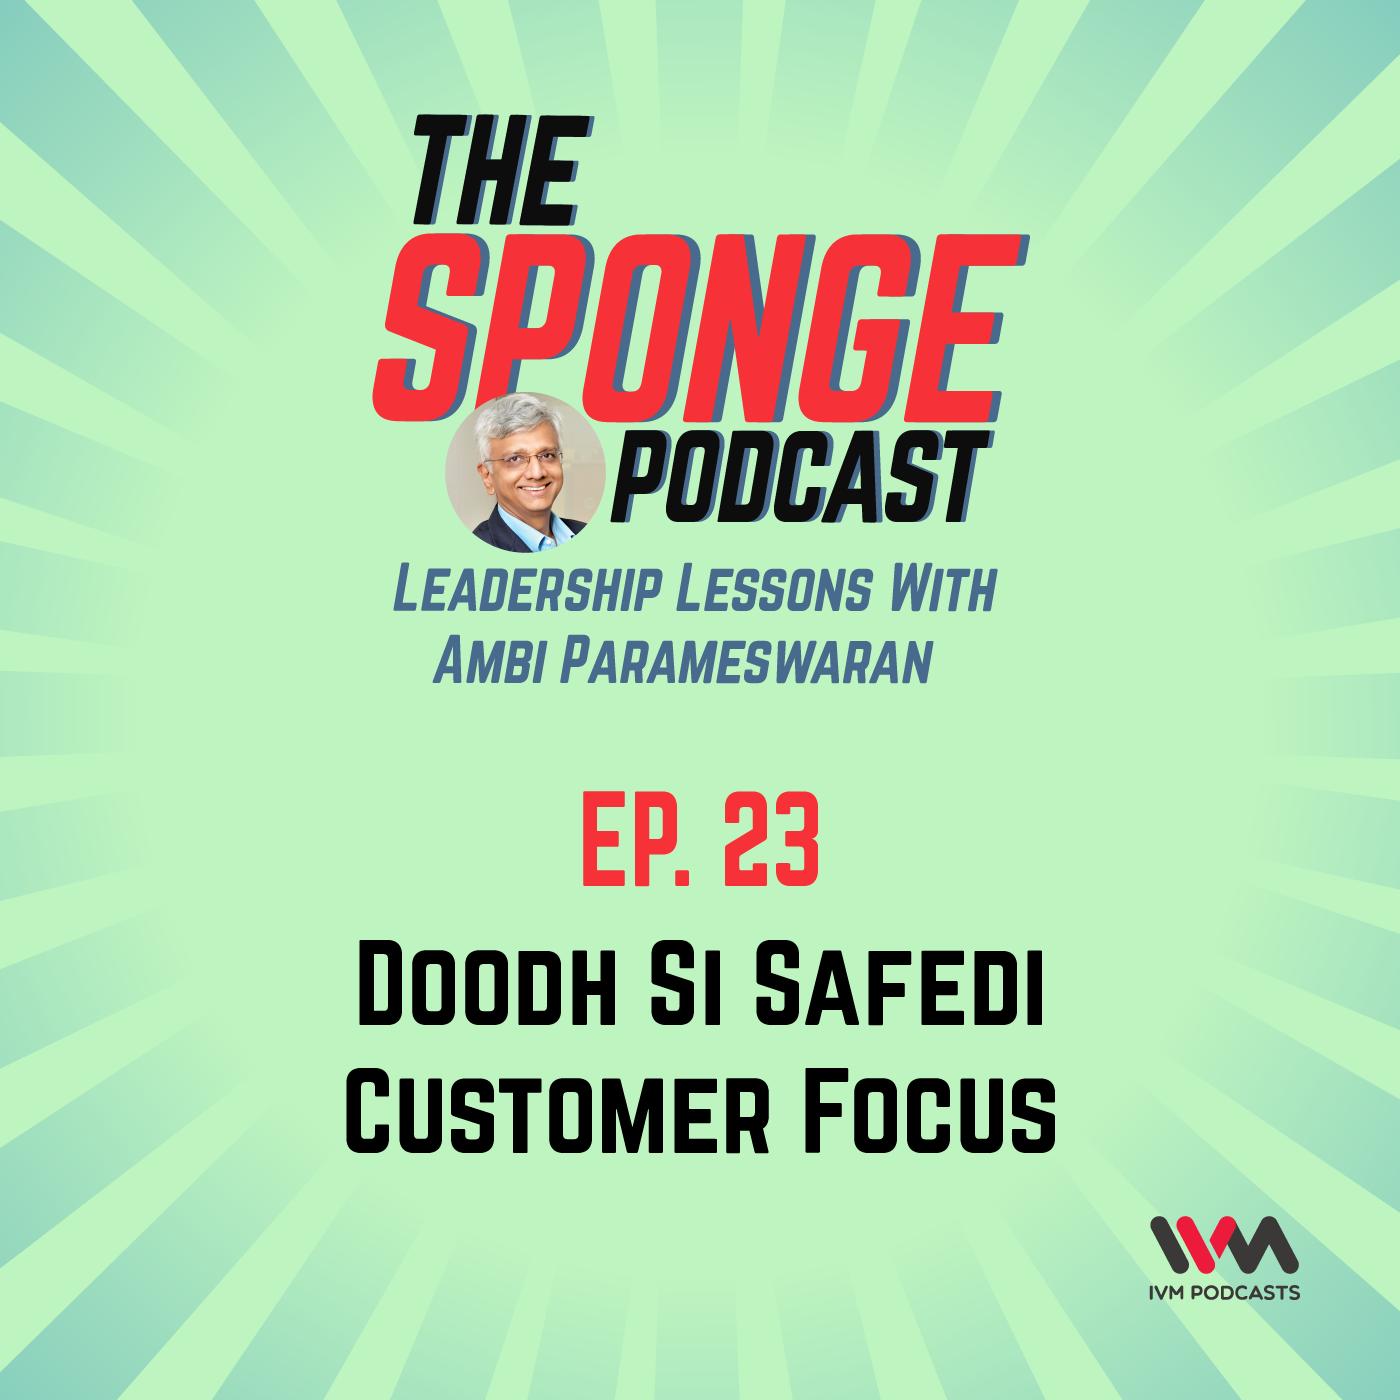 Ep. 23: Doodh Si Safedi Customer Focus